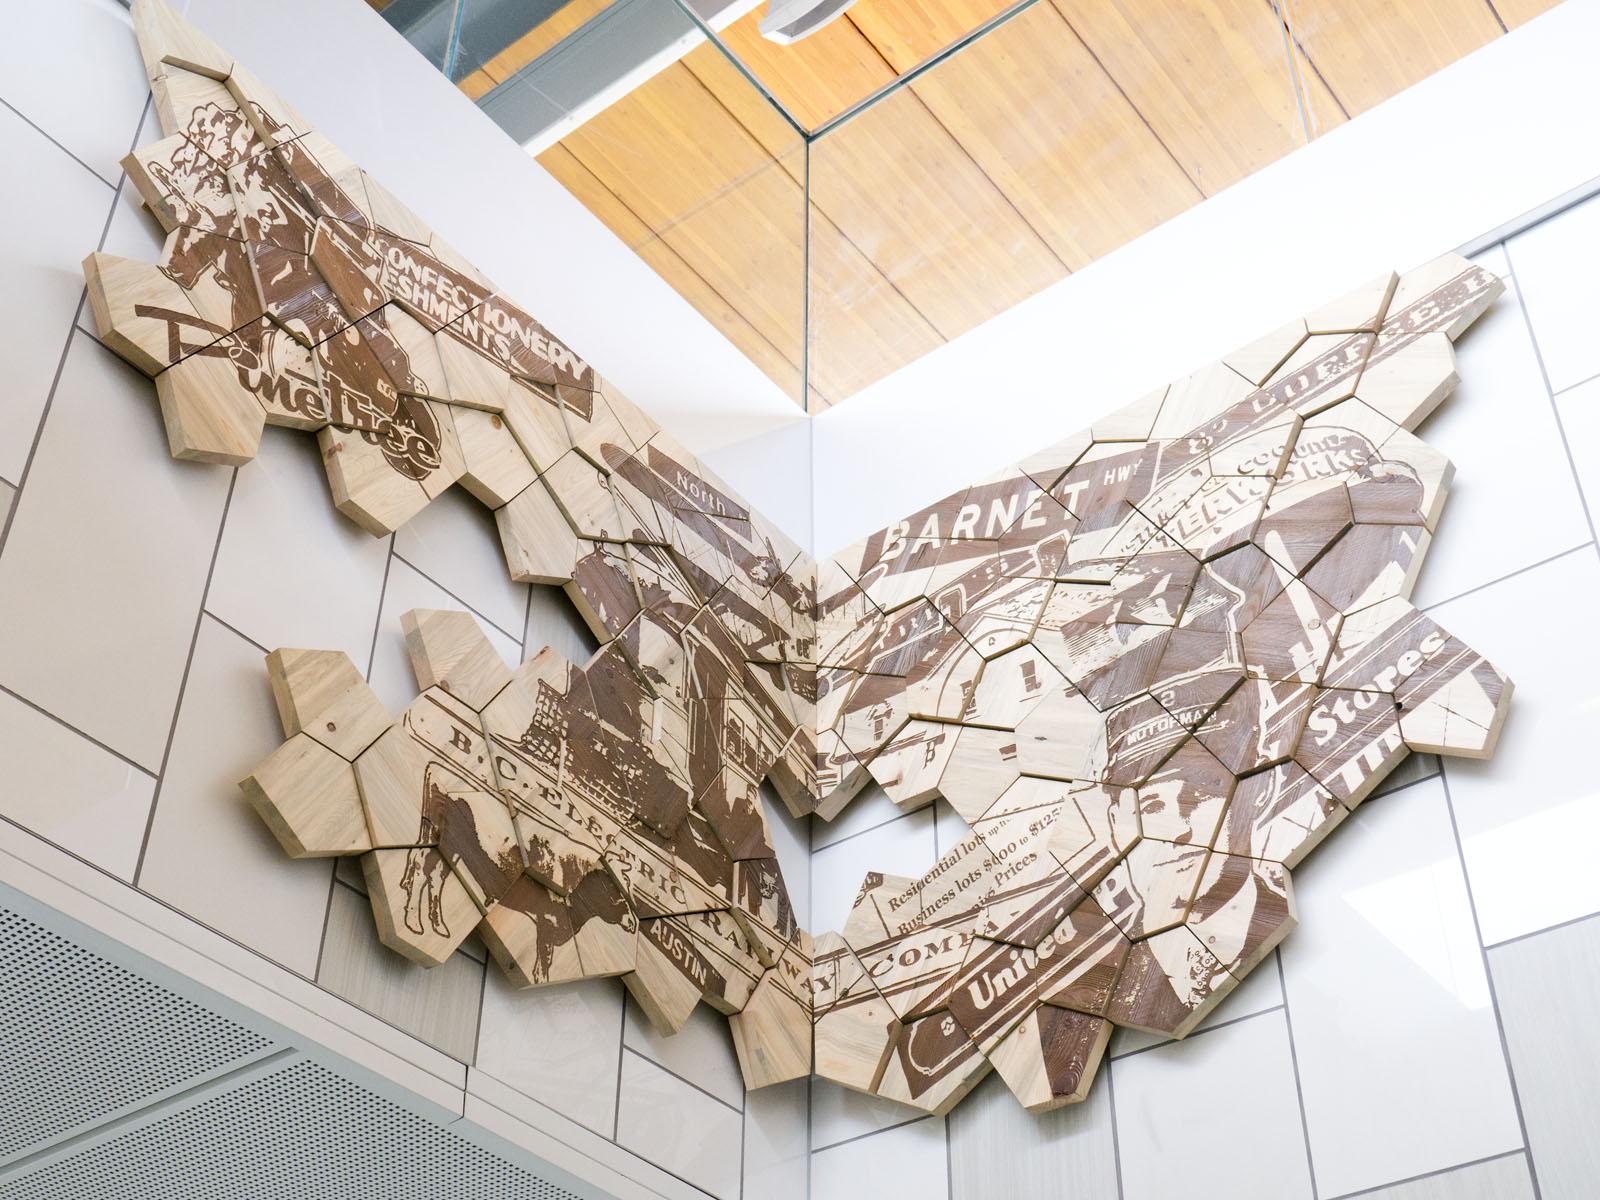 Lafarge lake – Douglas - skytrain station public art